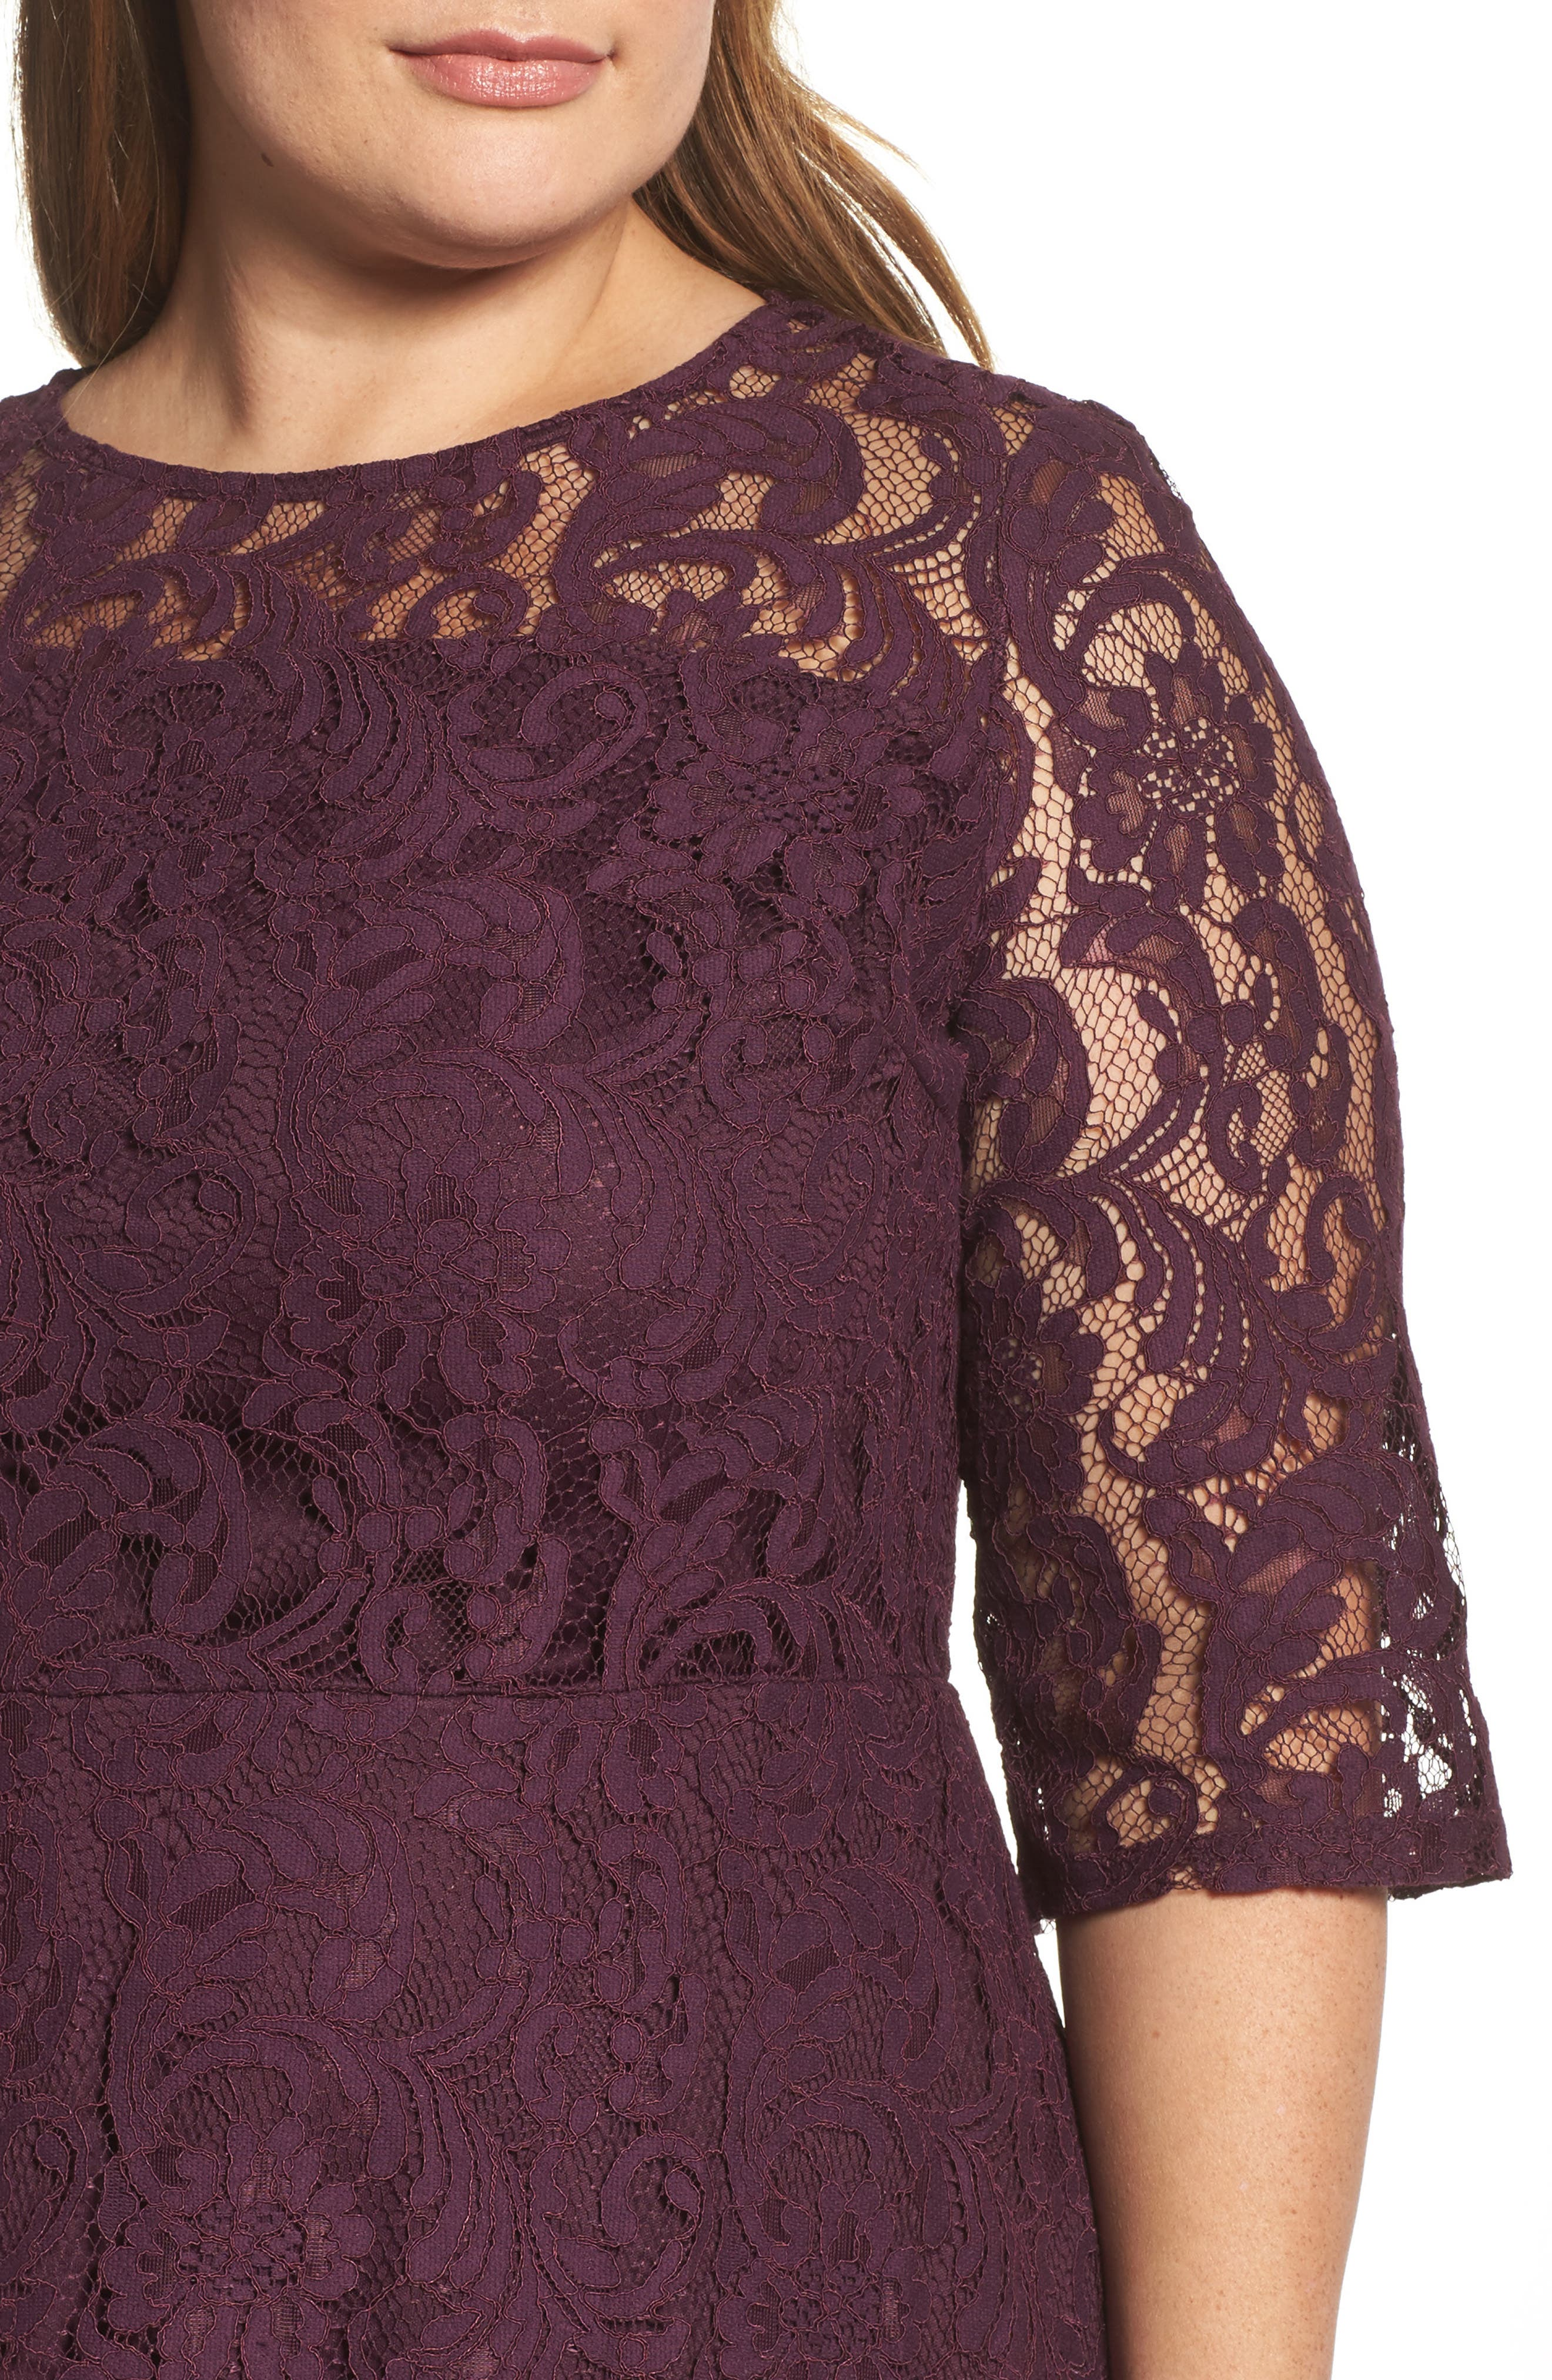 Lace Fit & Flare Dress,                             Alternate thumbnail 4, color,                             Burgundy